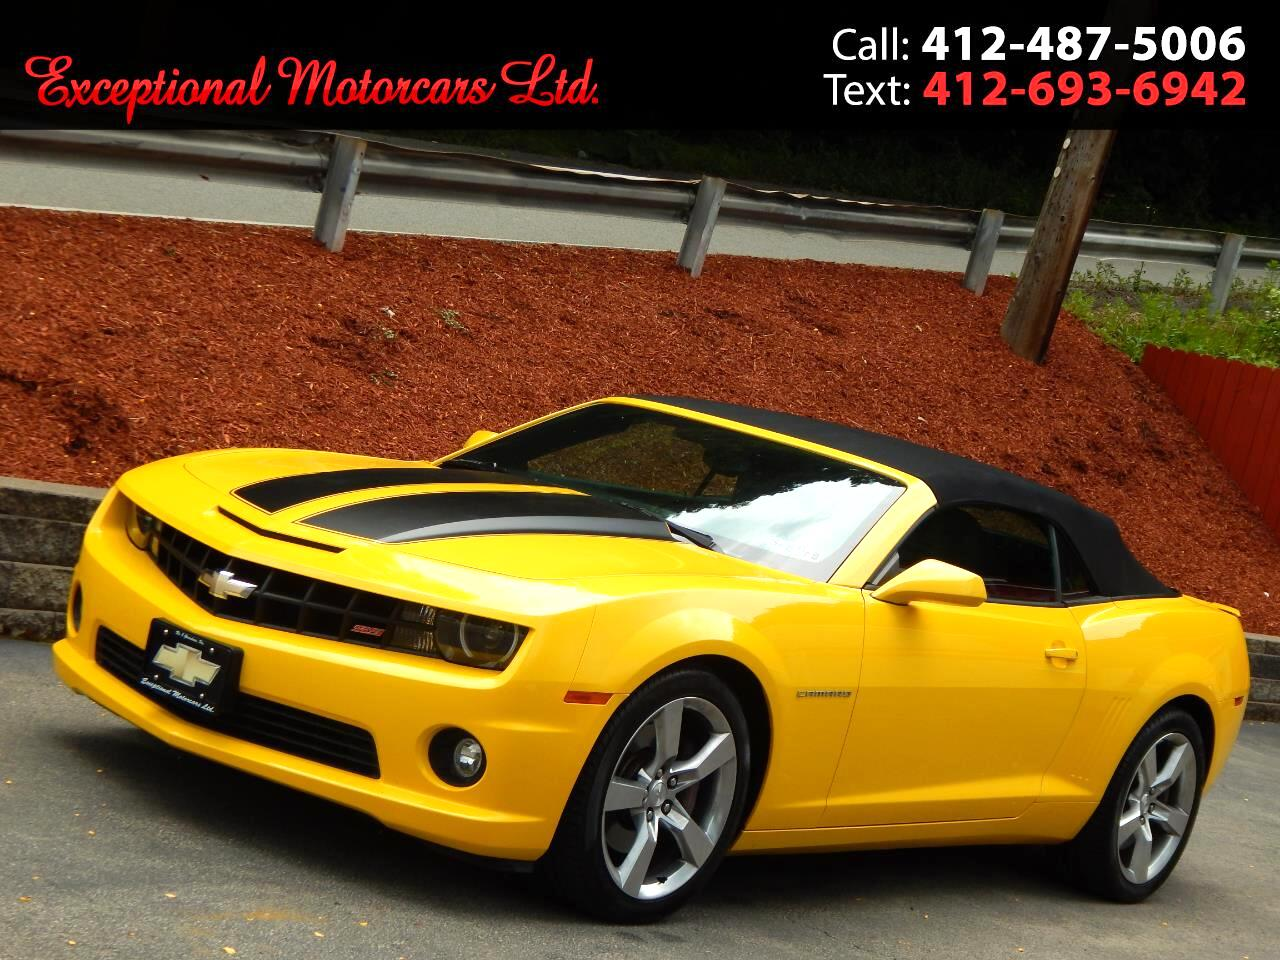 2011 Chevrolet Camaro 2dr Conv 2SS